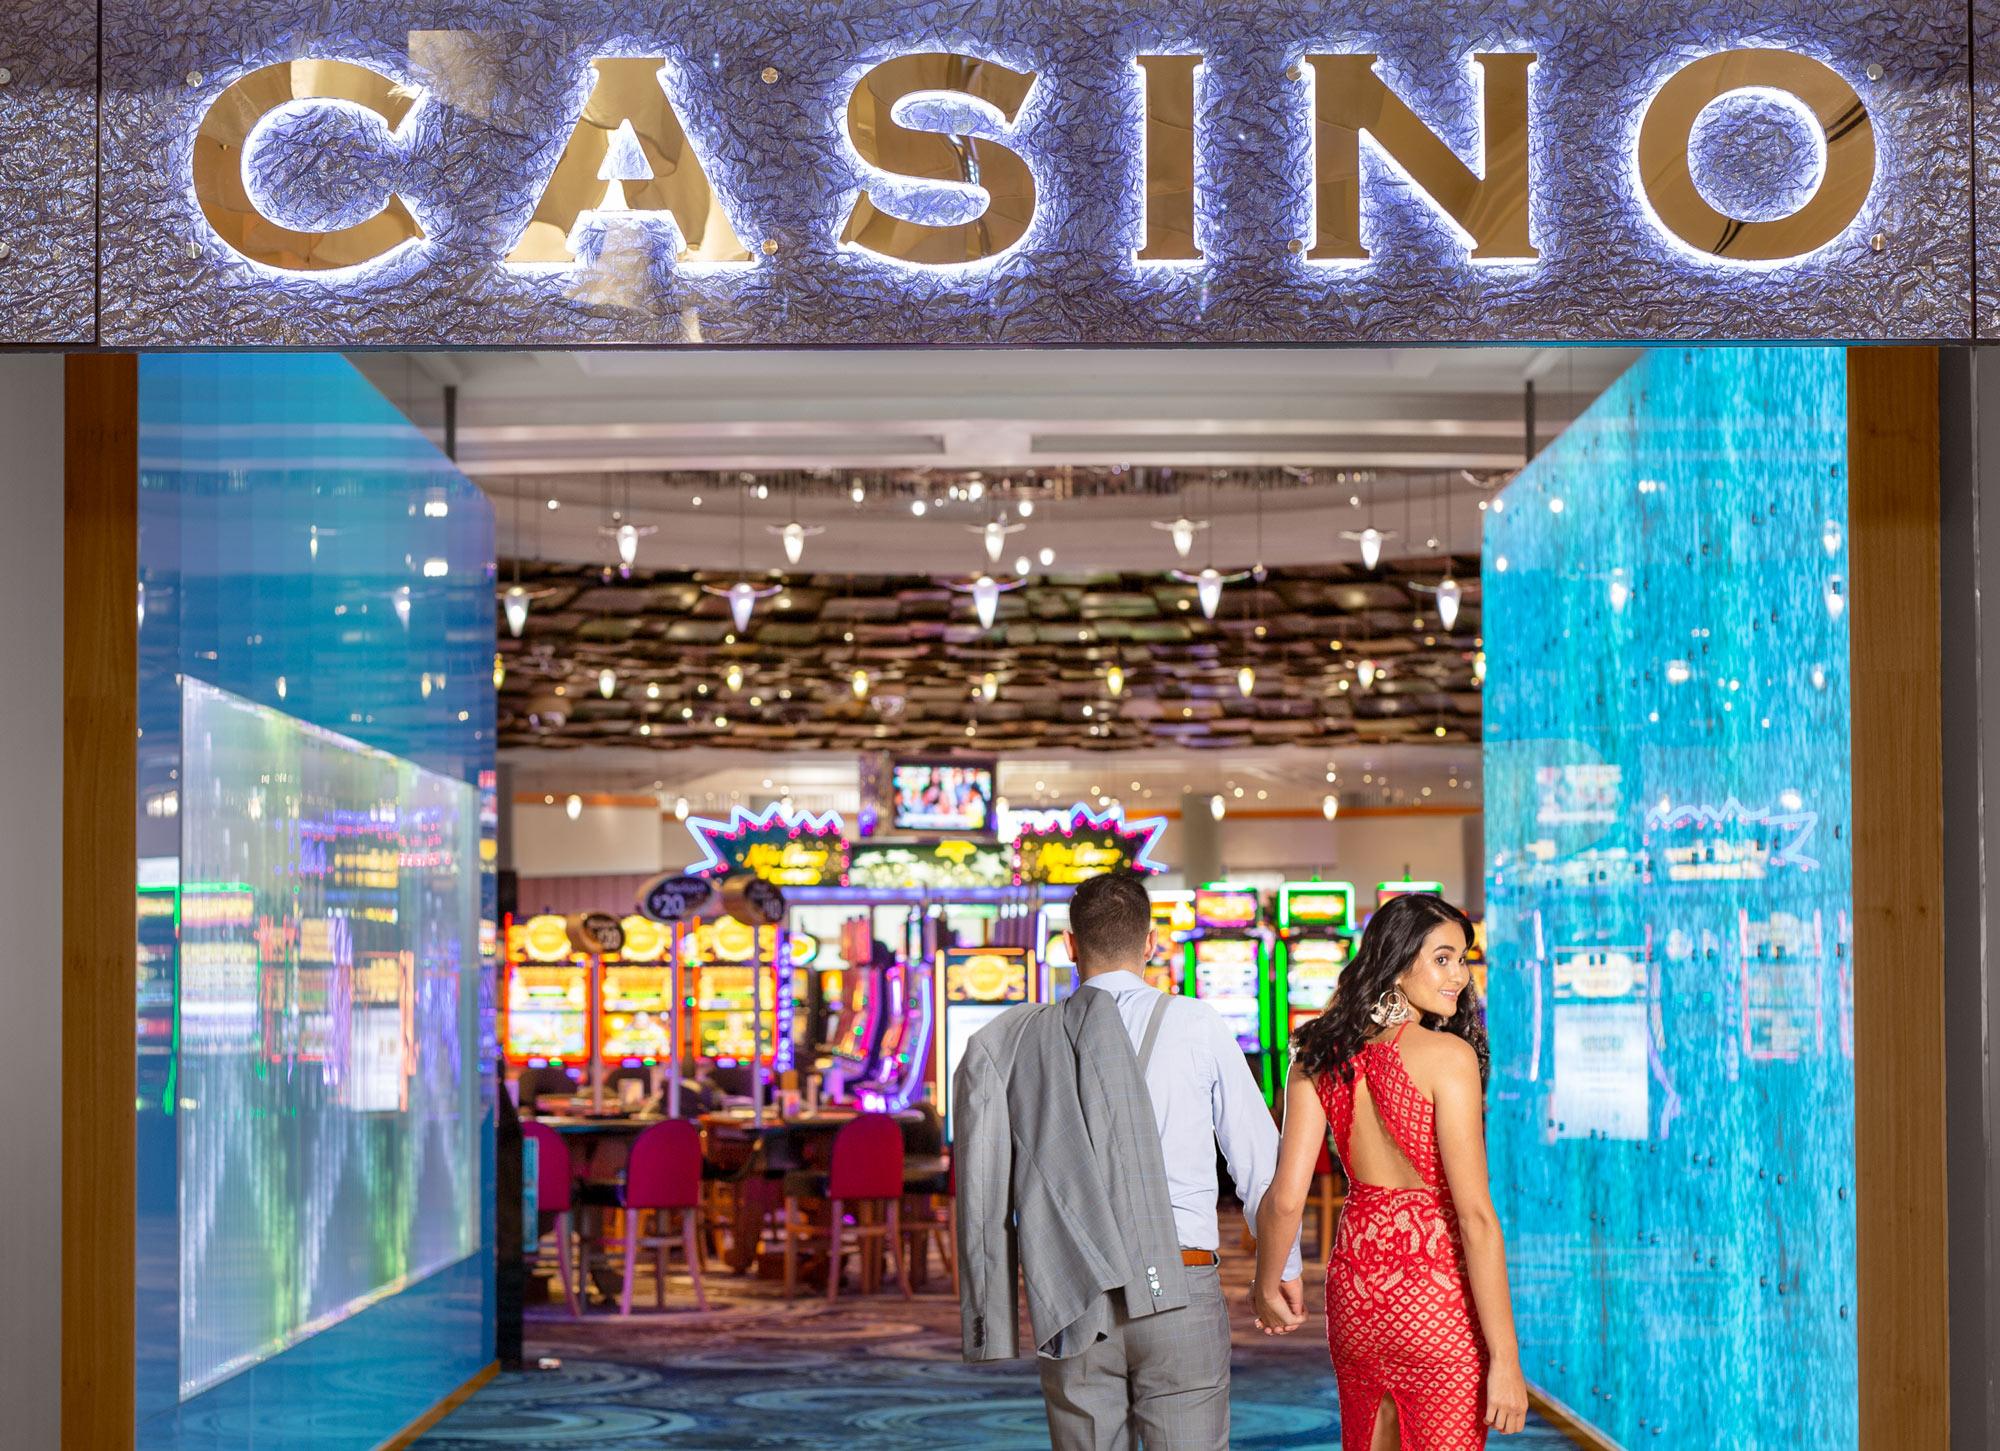 Hotel Casino Lifestyle Photography by Adrian Kilchherr Australia Europe Switzerland